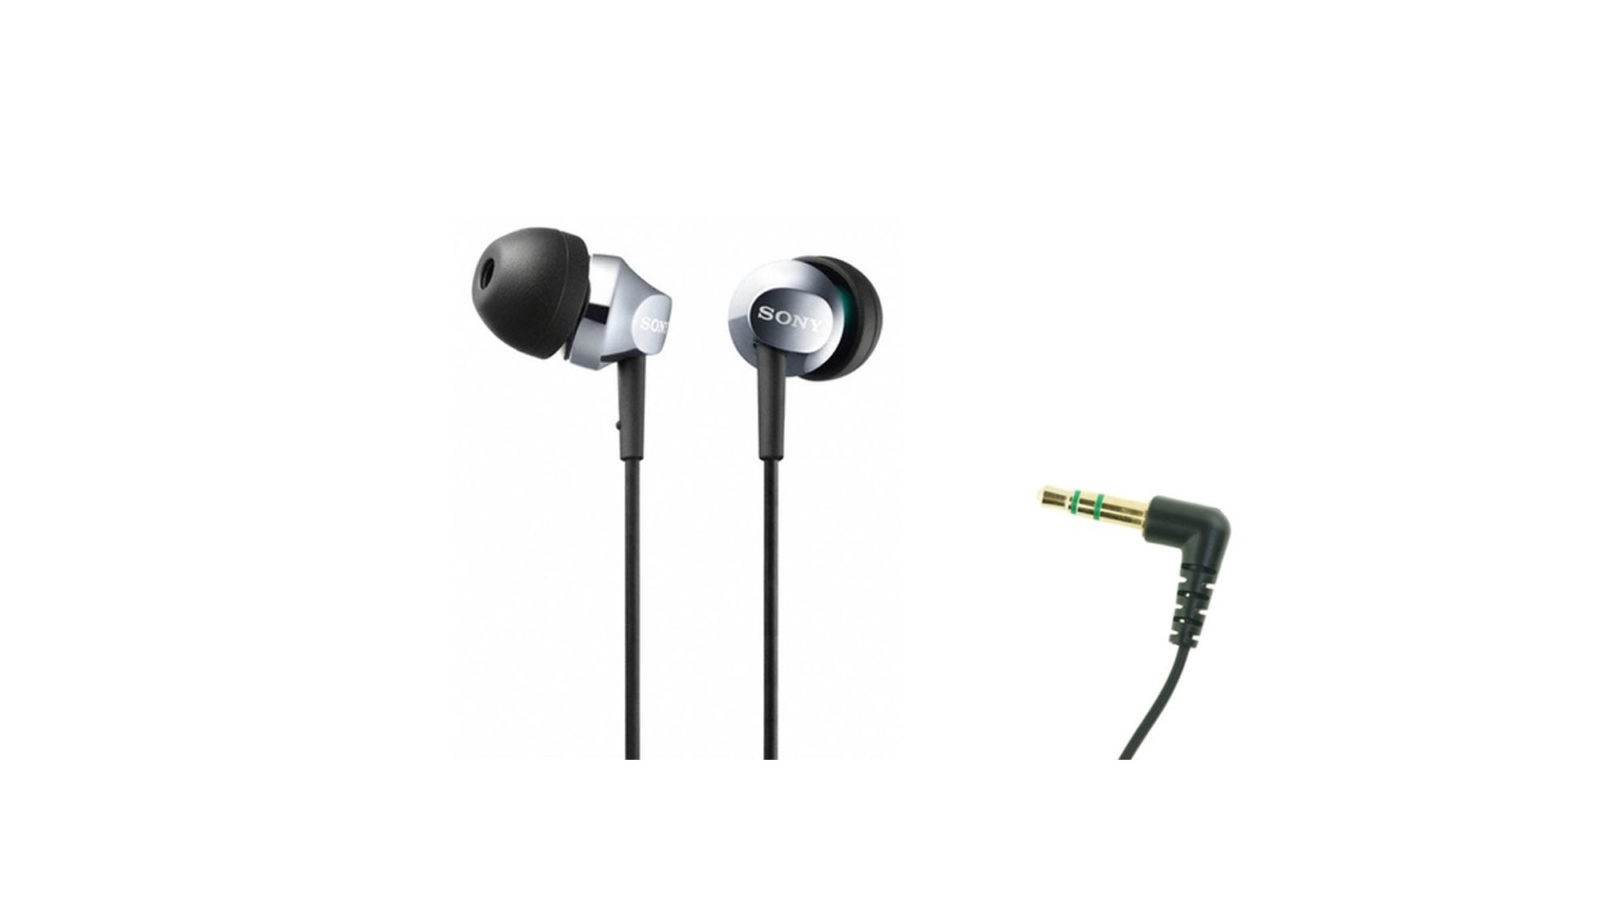 Sony MDR-Ex50Lp Kulakiçi Kulaklık